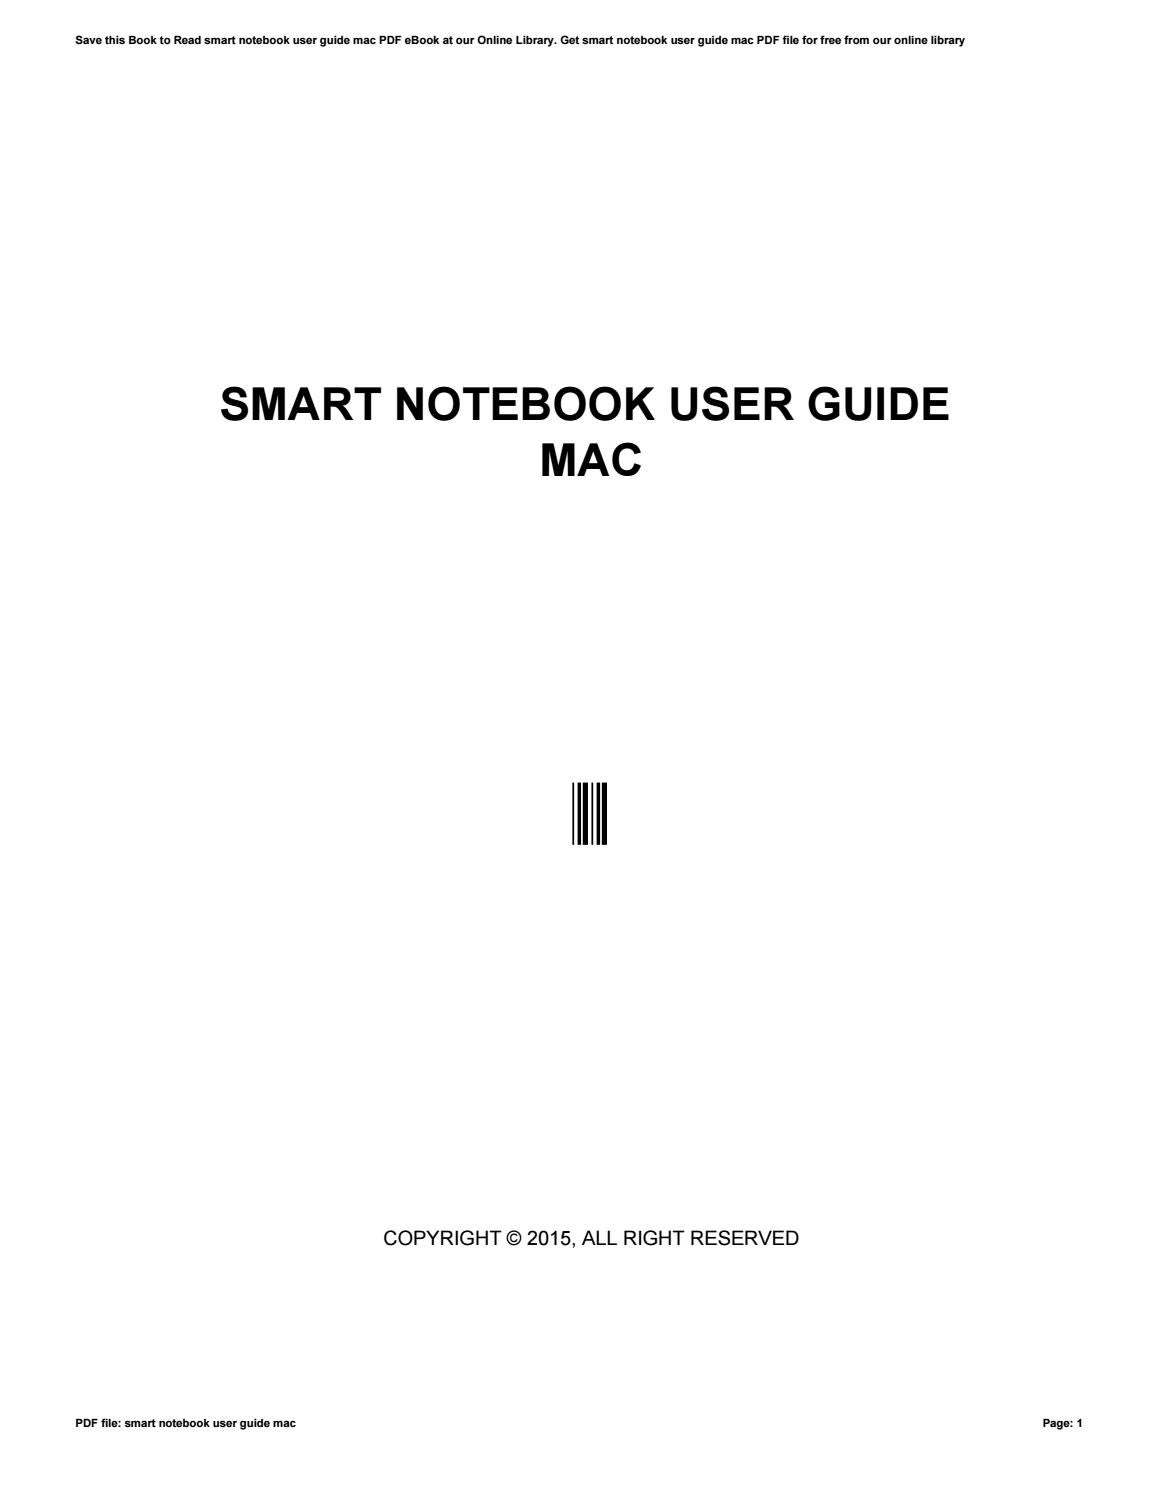 Pdfexplode user guide onekerato.